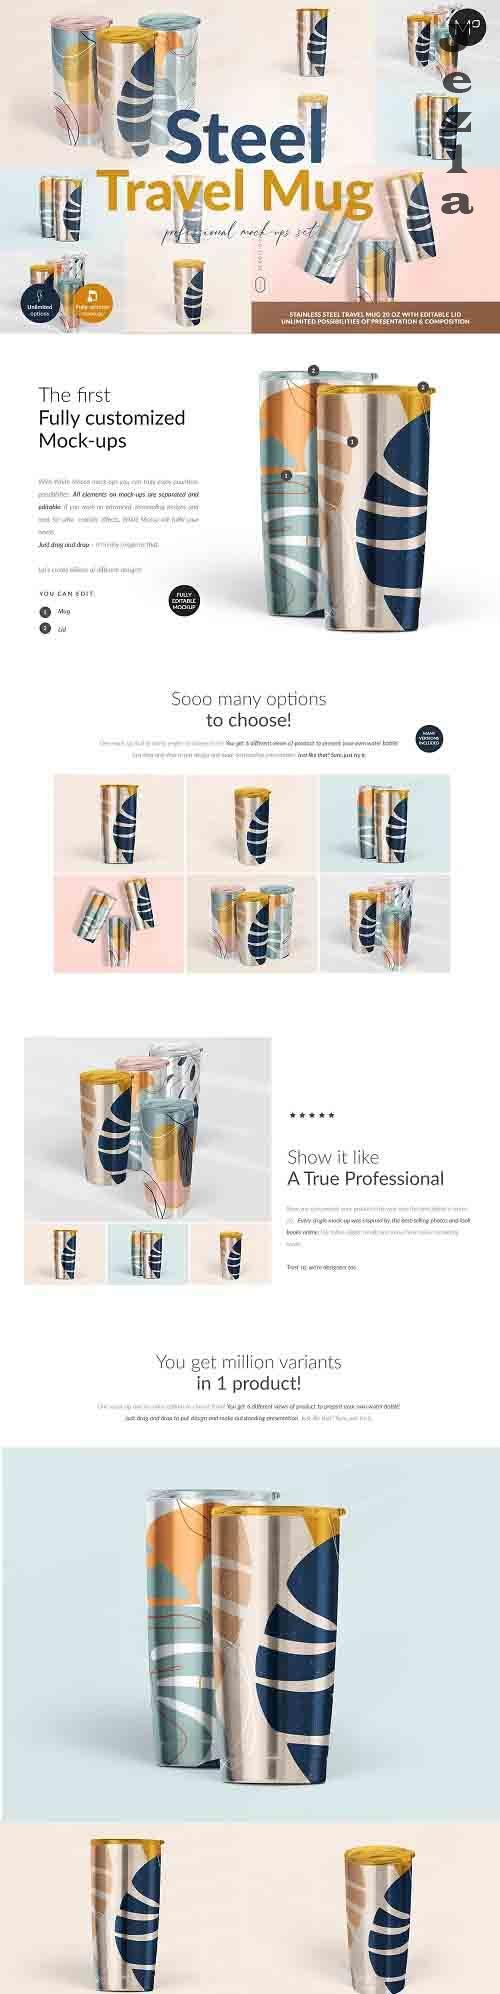 CreativeMarket - Travel Mug Professional Mock-ups Set 5502633